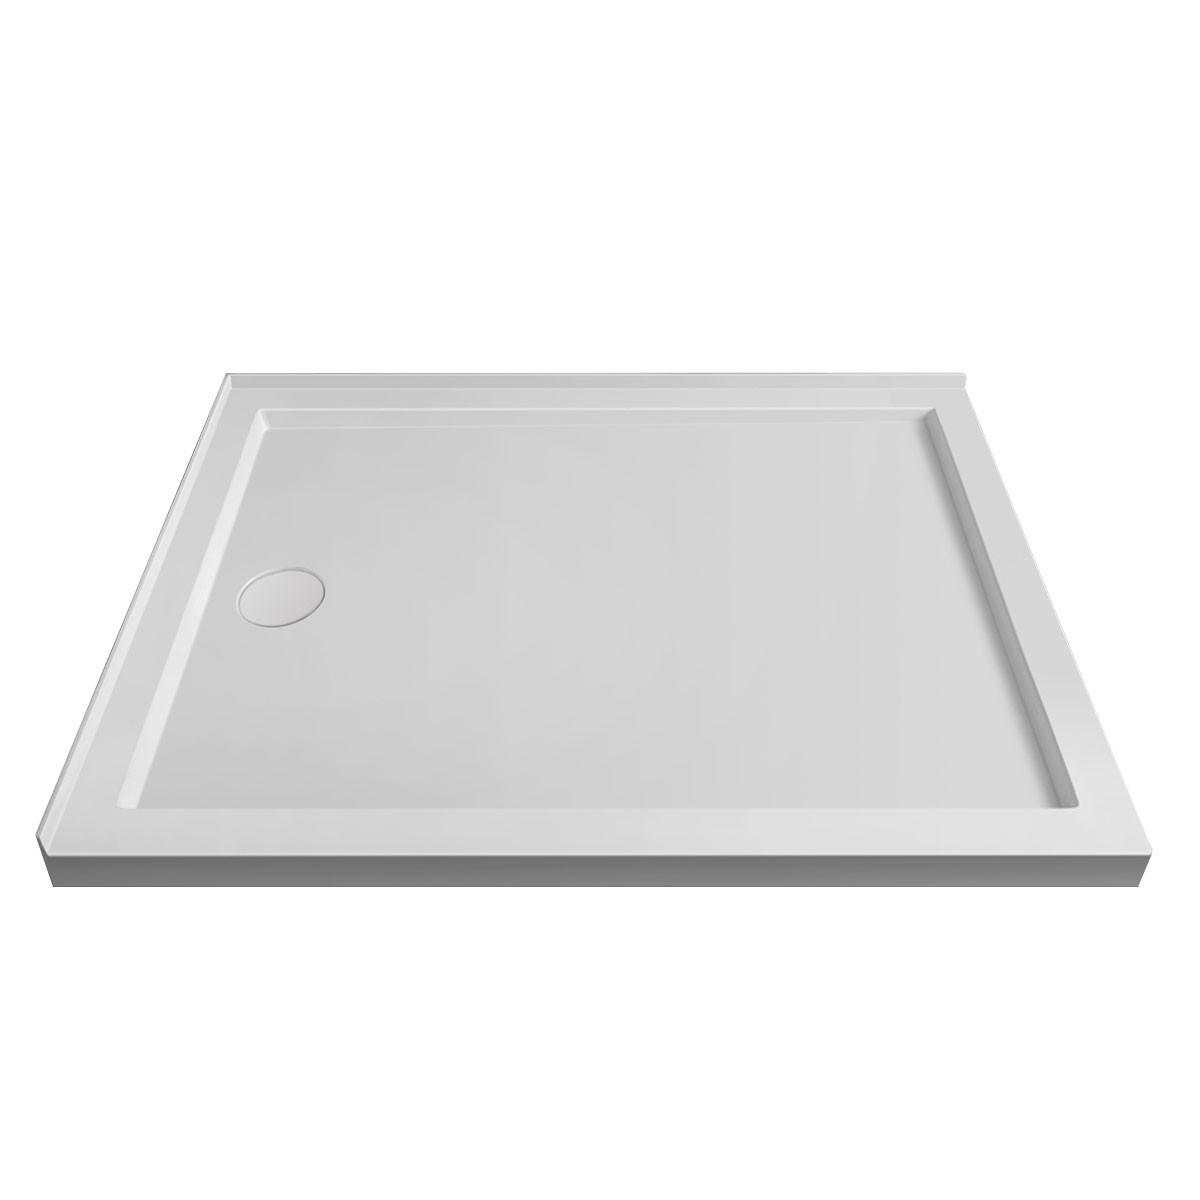 "Base de douche rectangulaire 48"" x 36"" pour installation coin gauche (DK-STA-18002)"